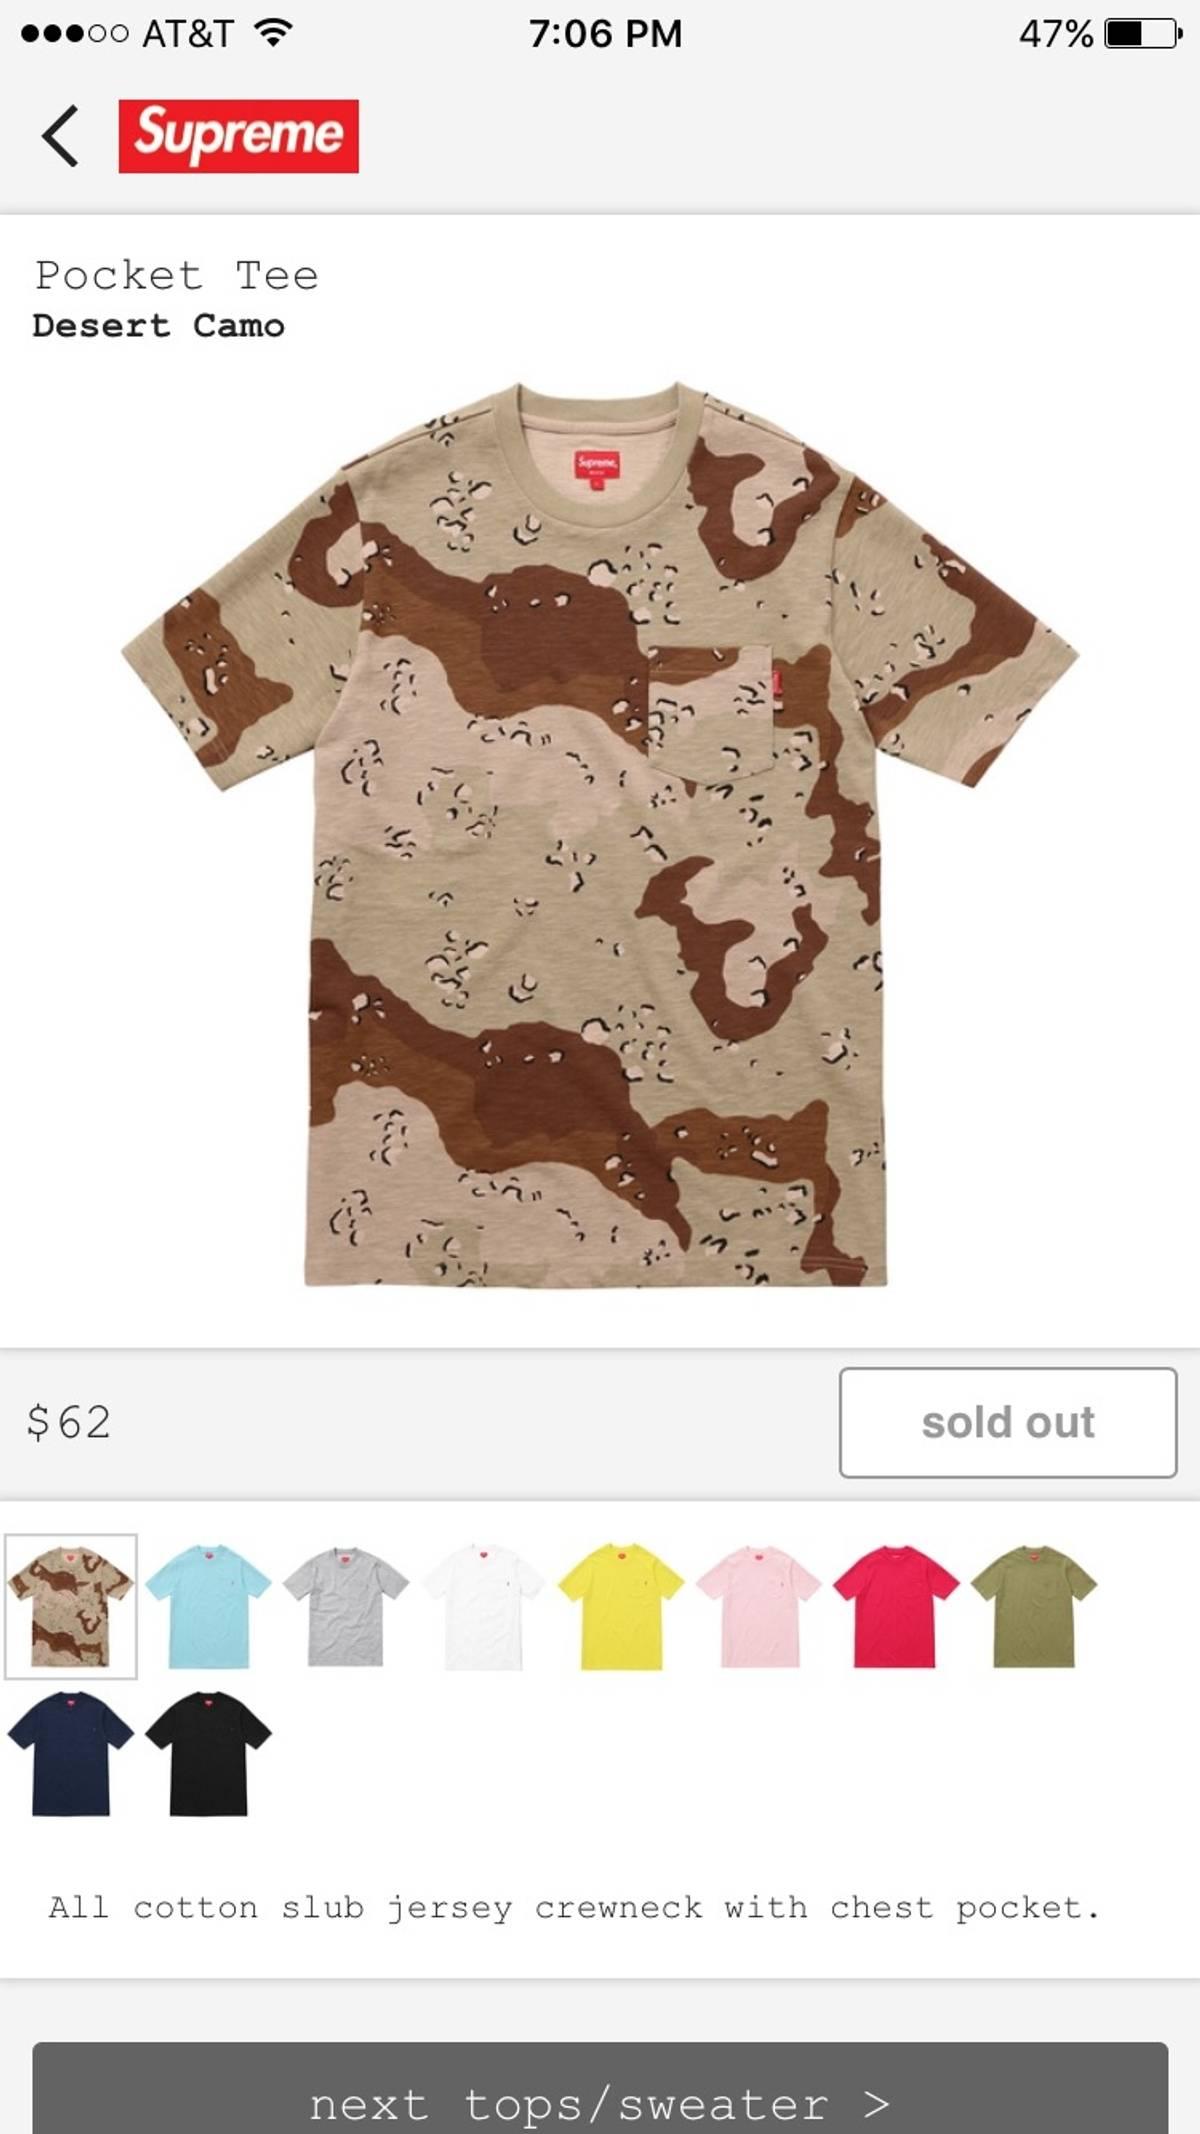 3574b95c8034 Supreme Supreme Desert Camo Pocket Tee Size l - Short Sleeve T-Shirts for  Sale - Grailed